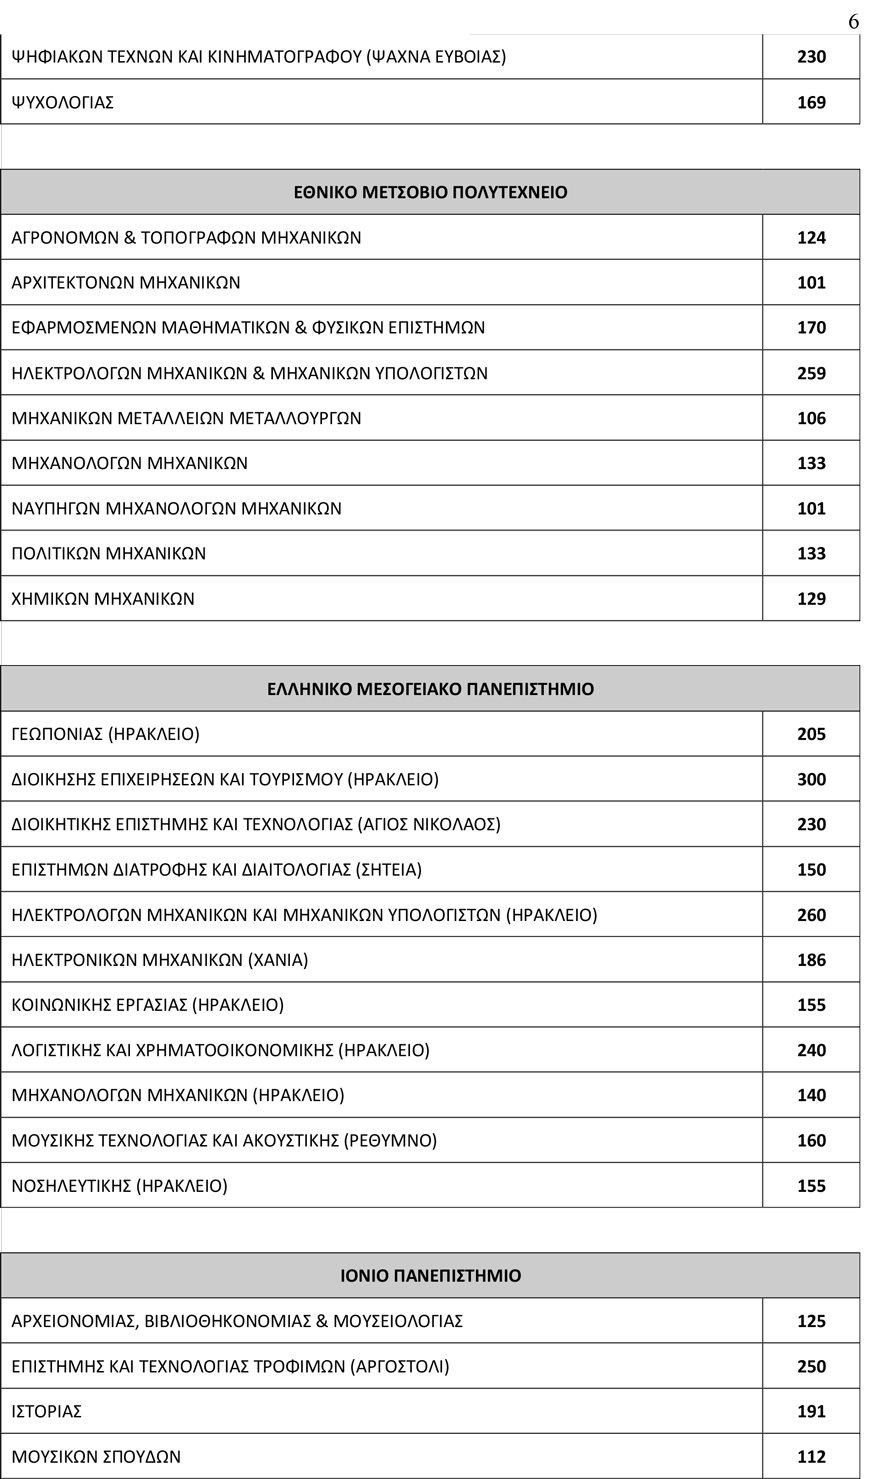 arrithmos_eisakt6 78.335 θα εισαχθούν φέτος στα Πανεπιστήμια - Αυξημένος κατά 3.500 ο αριθμός